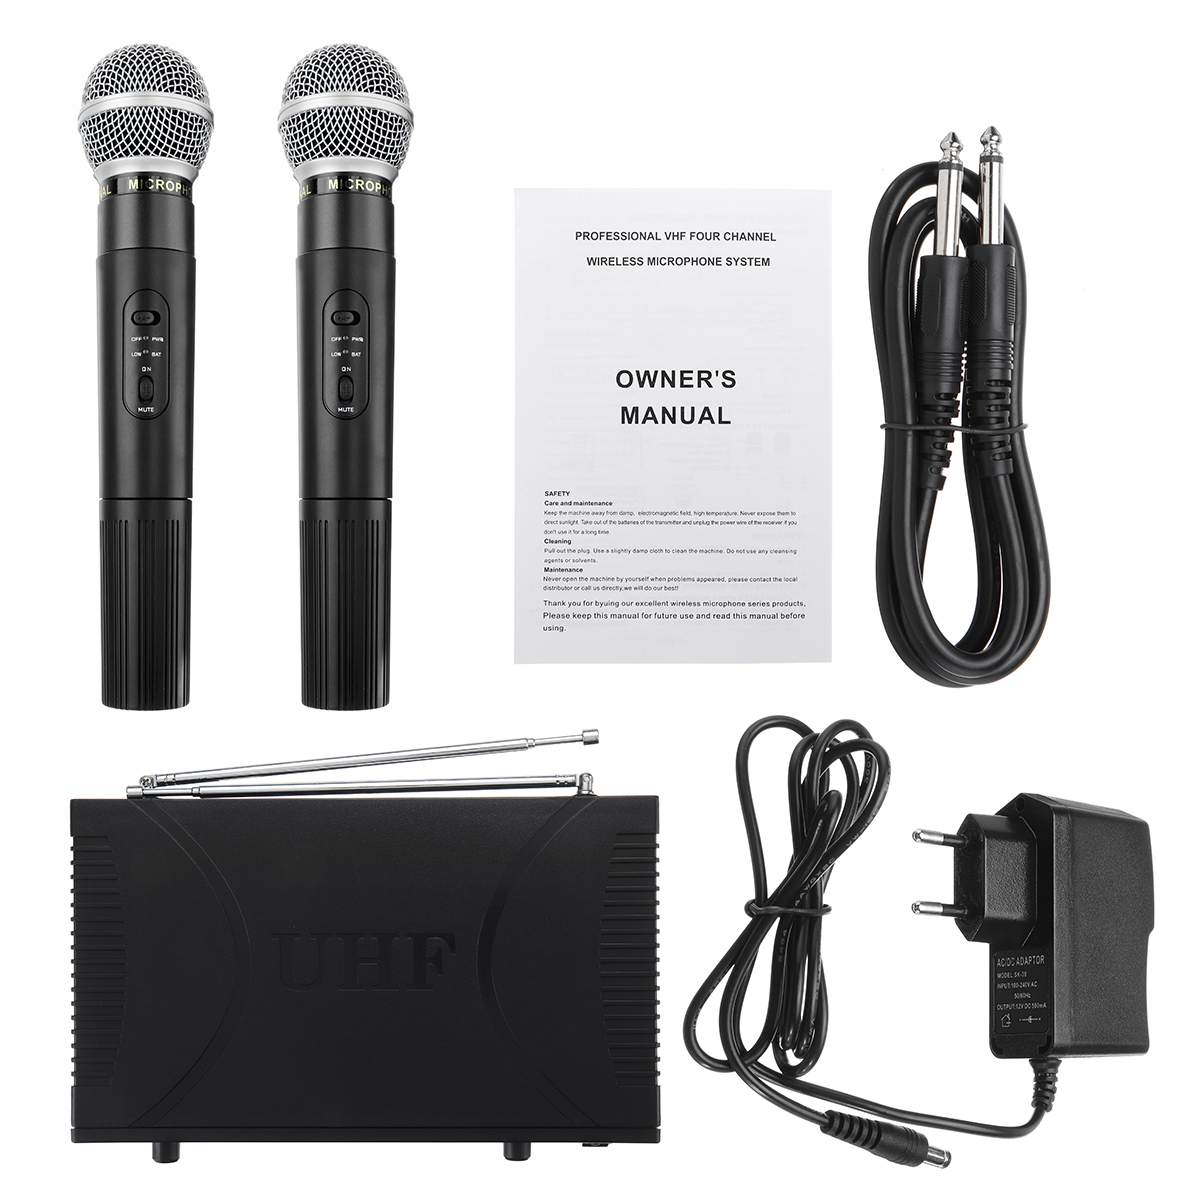 220V EU/UK/US Plug UHF 2 Channel  Professional Wireless Microphone Cordless System Handheld Karaoke For KTV Stage